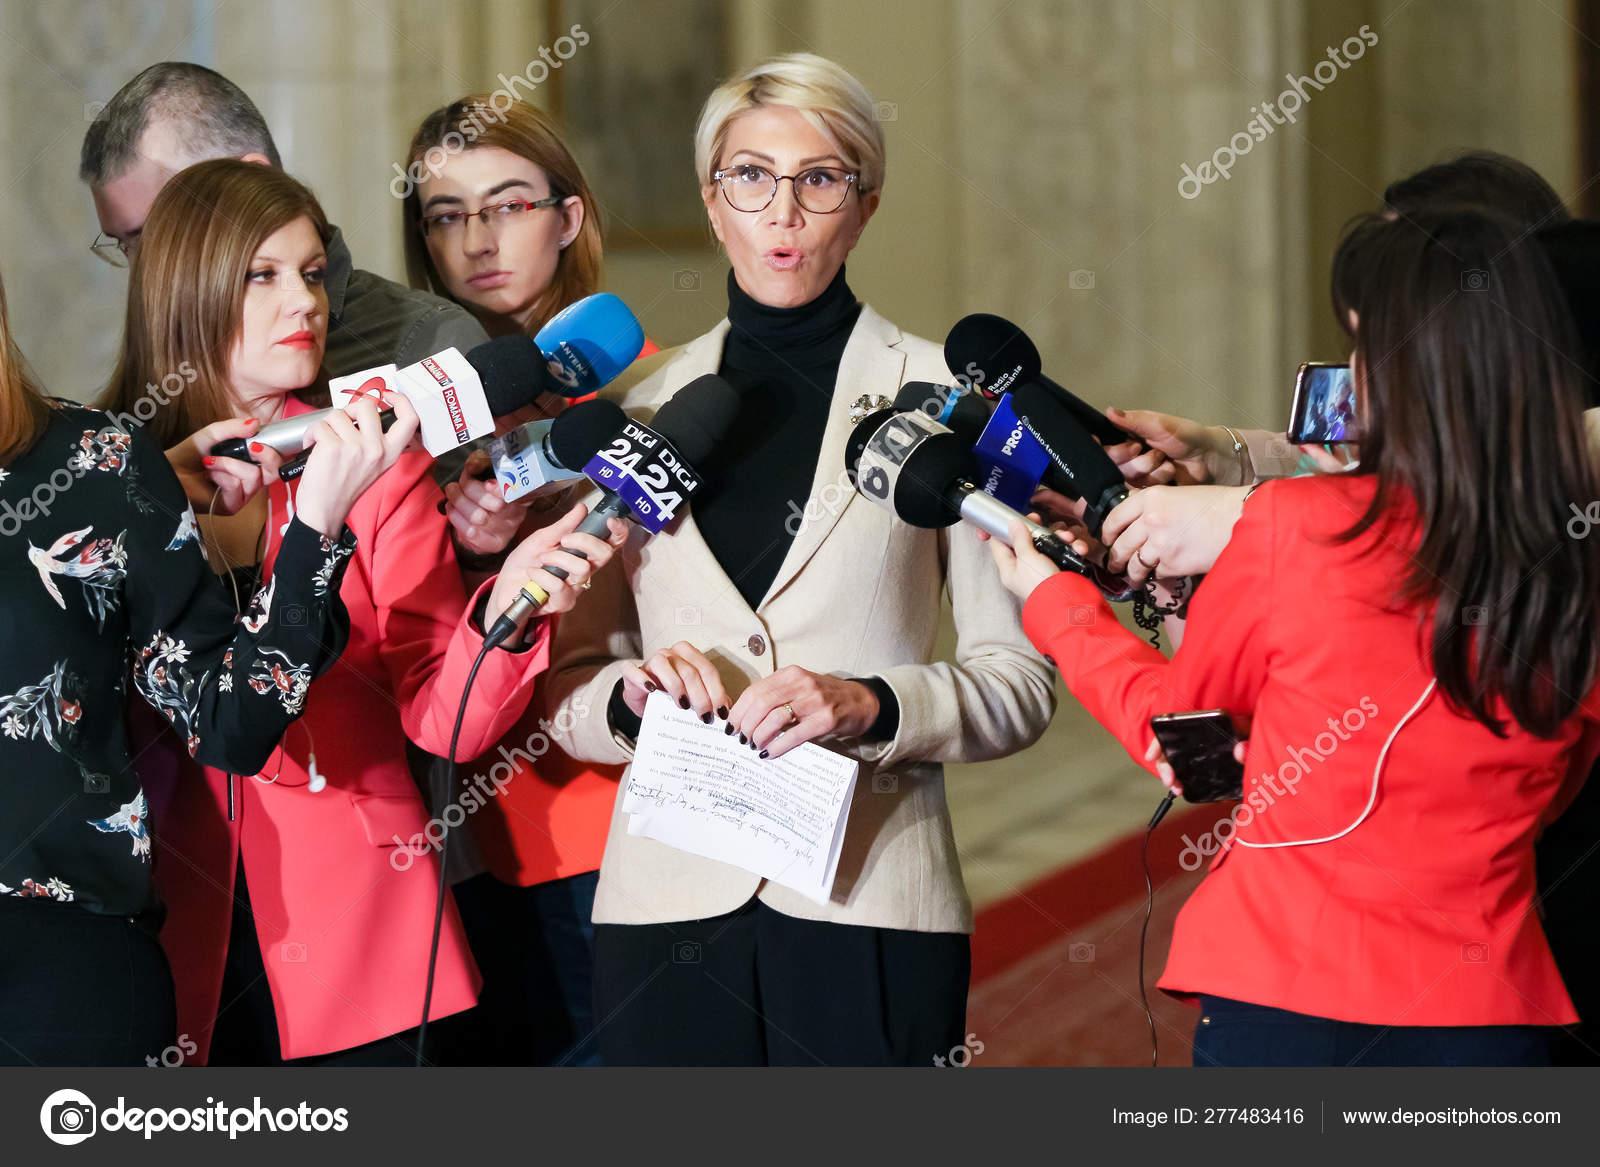 Romania politics - Raluca Turcan - National Liberal Party